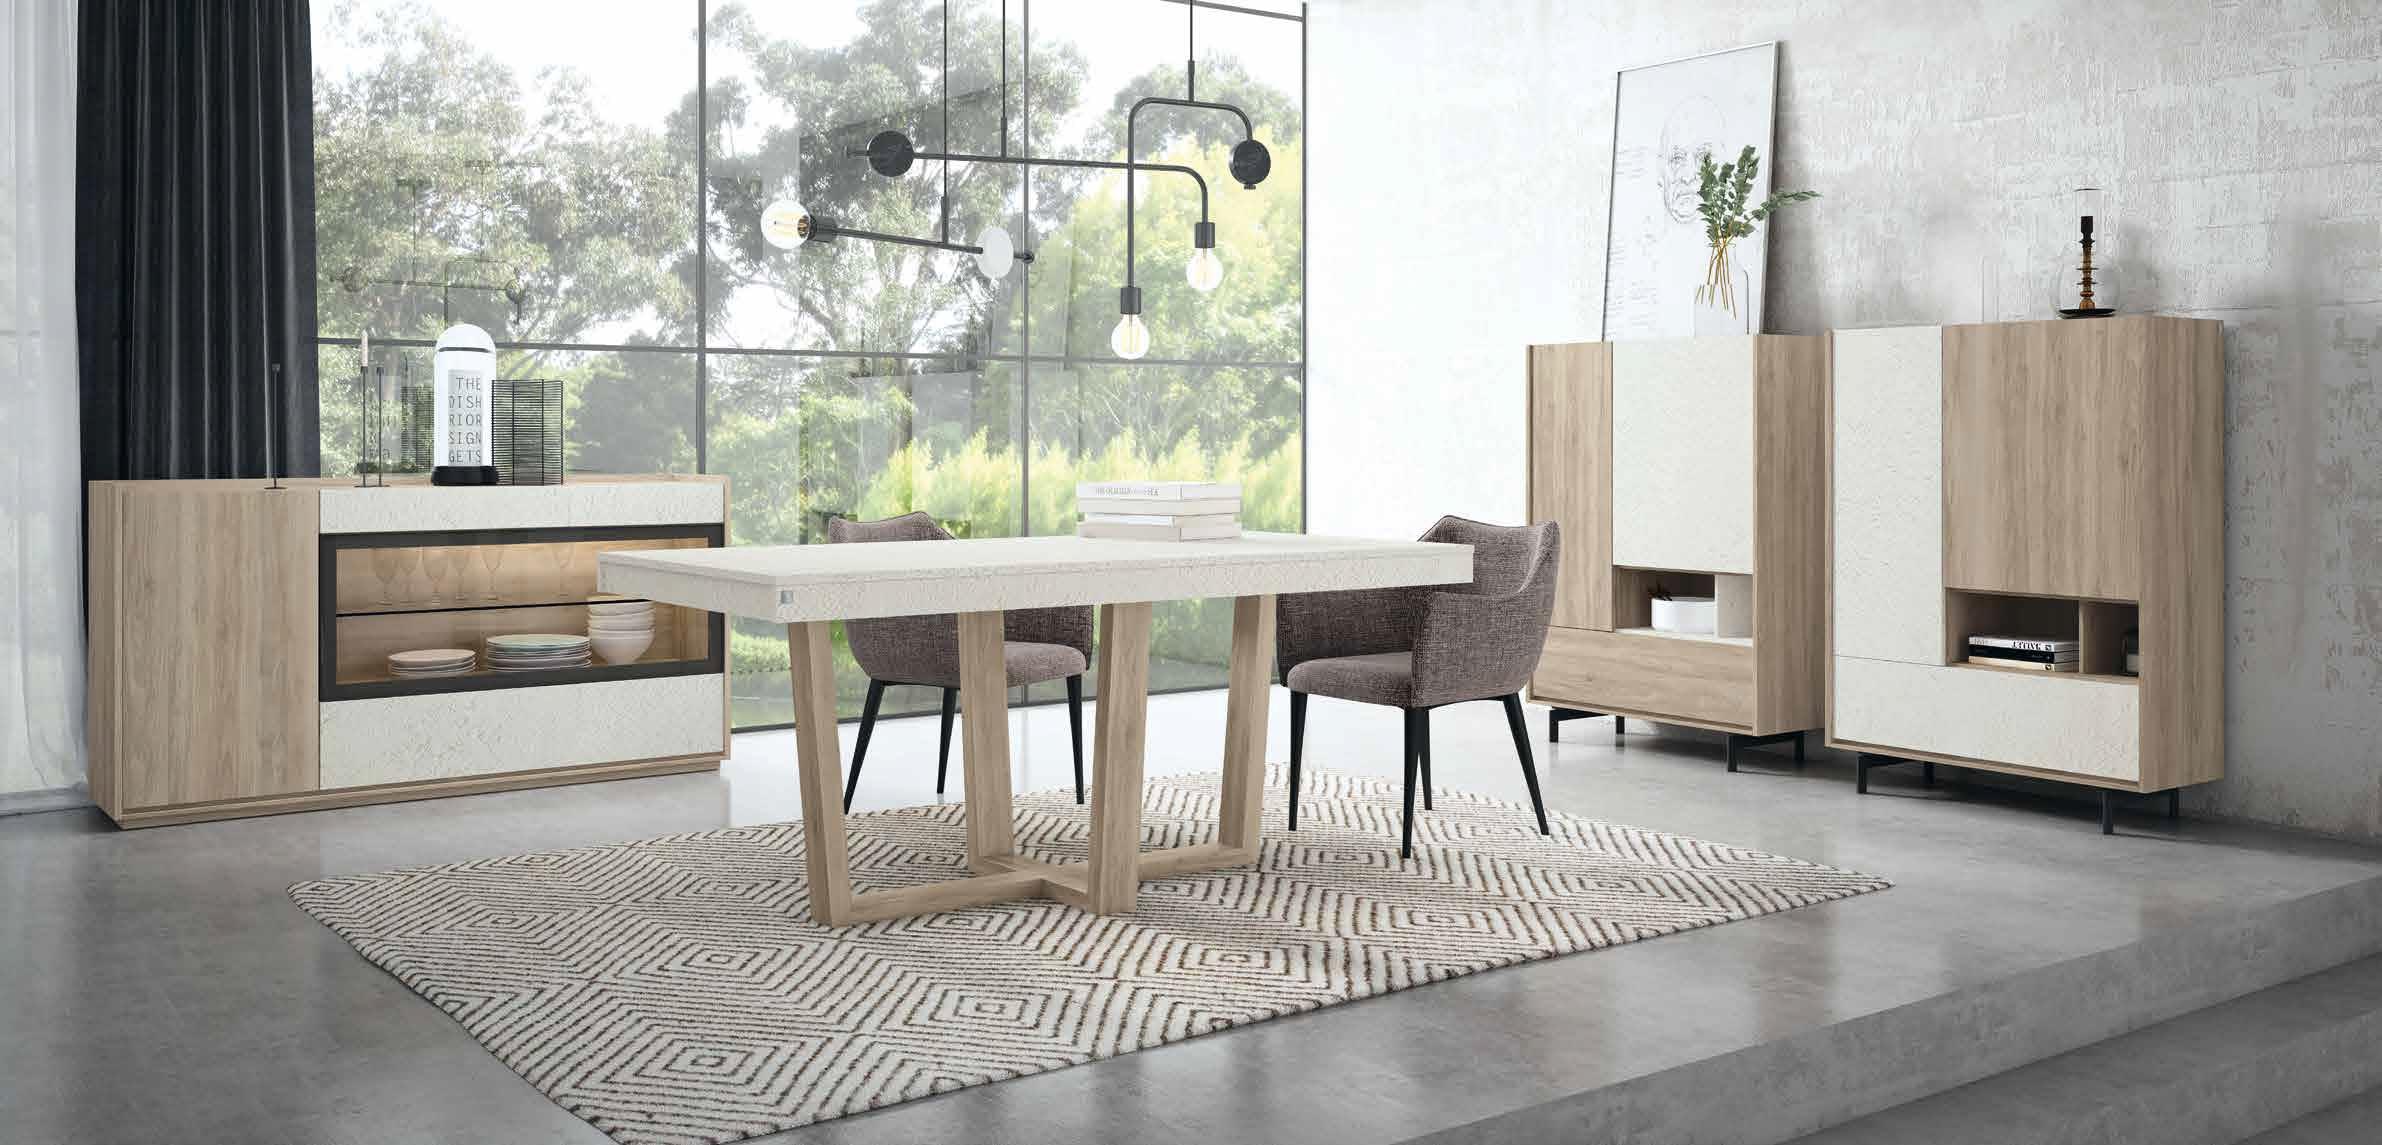 salon-moderno-Nativ-2019-muebles-paco-caballero-0920-5c8ceabd50d57